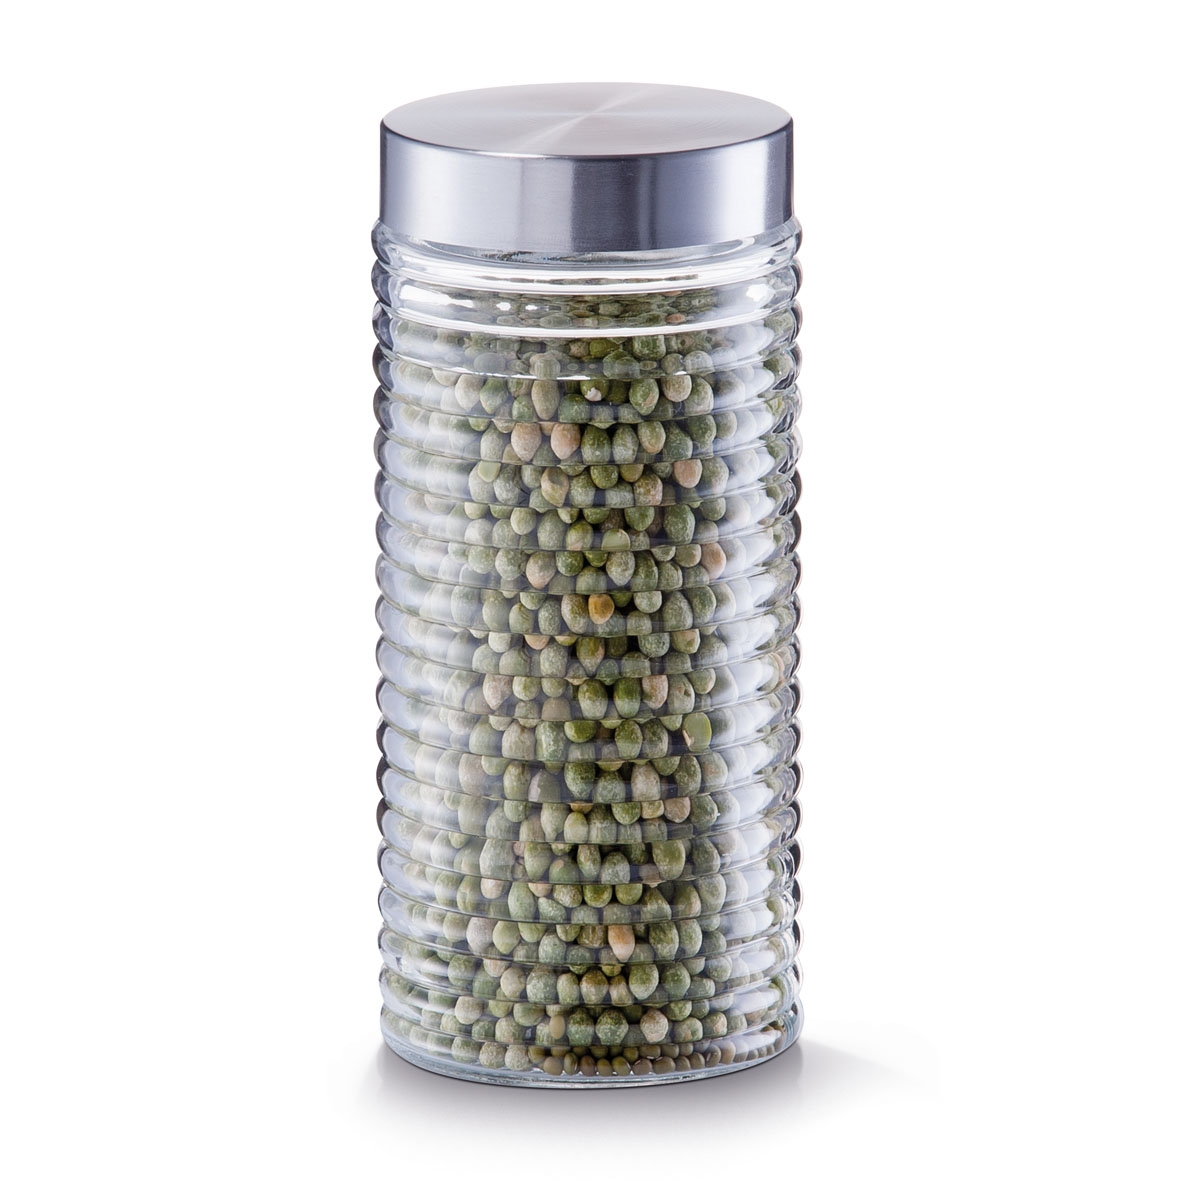 Recipient pentru depozitare Geri, capac inox, Glass 1400 ml, Ø 10,5xH22,5 cm poza